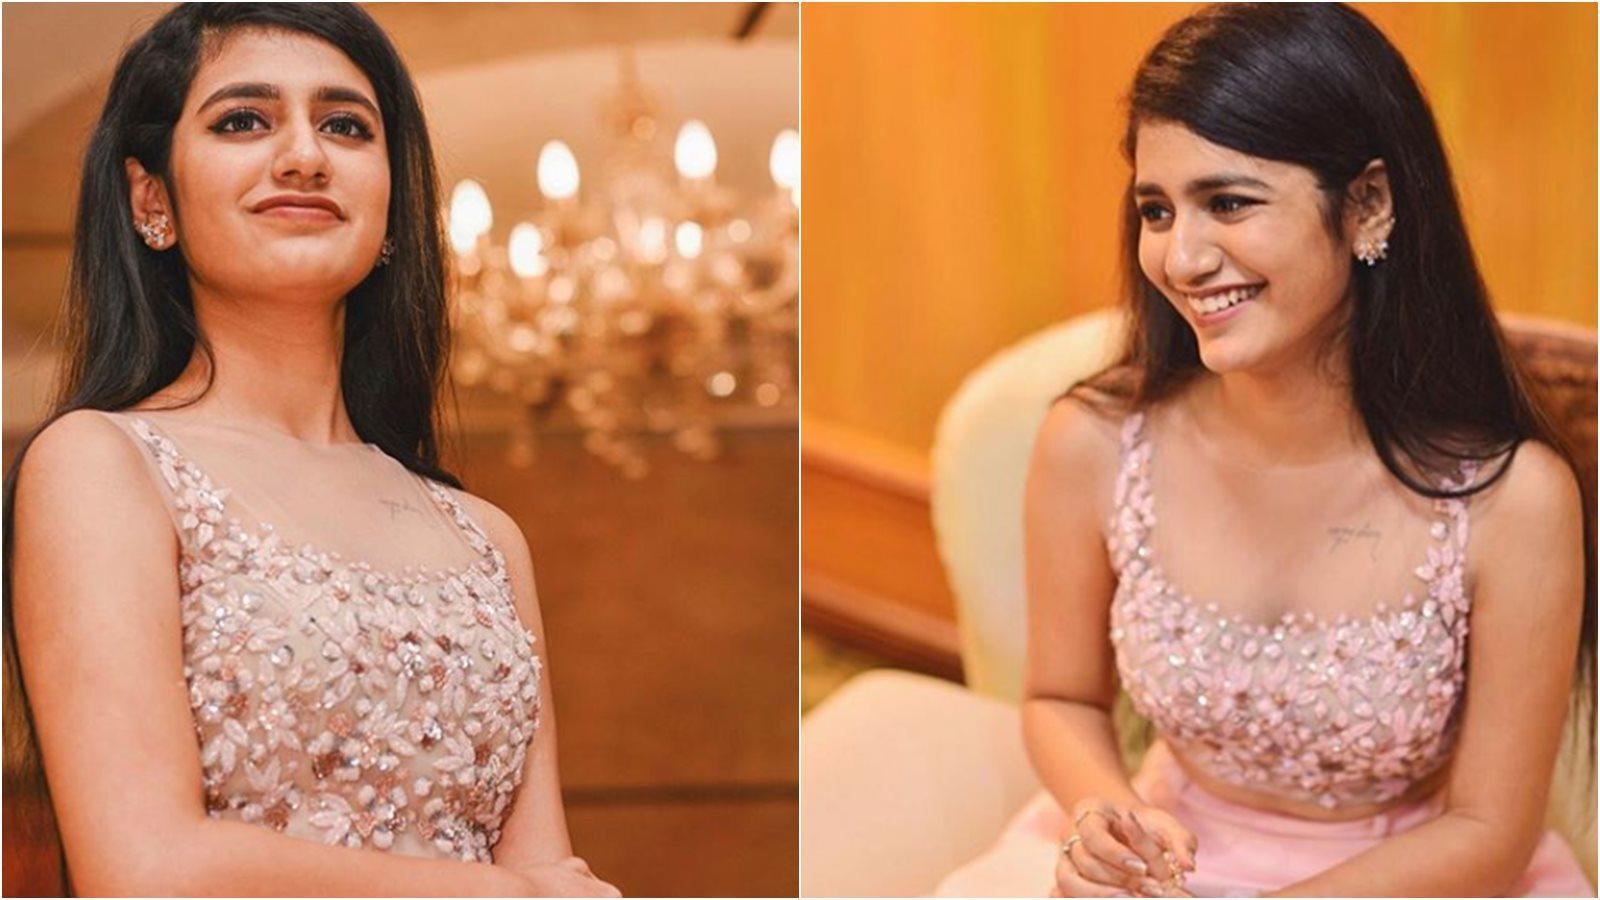 wink-girl-priya-prakash-varrier-looks-pretty-in-pink-in-latest-pictures